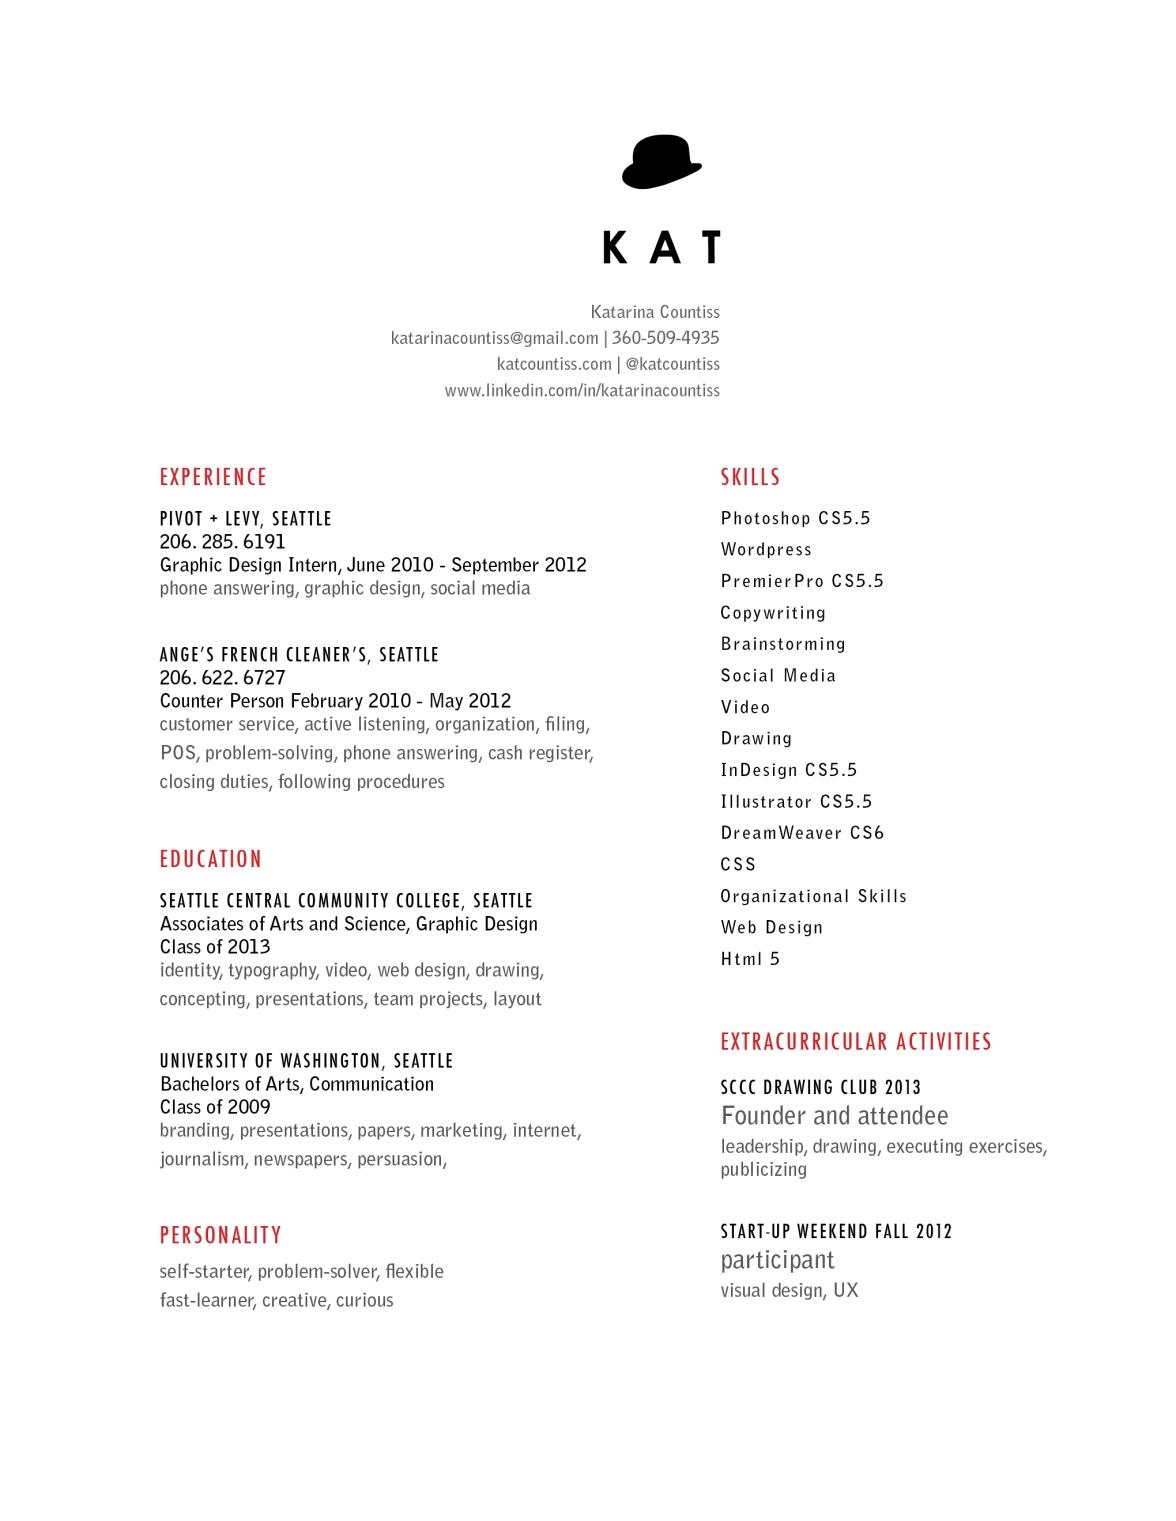 katarina_countiss_resume2